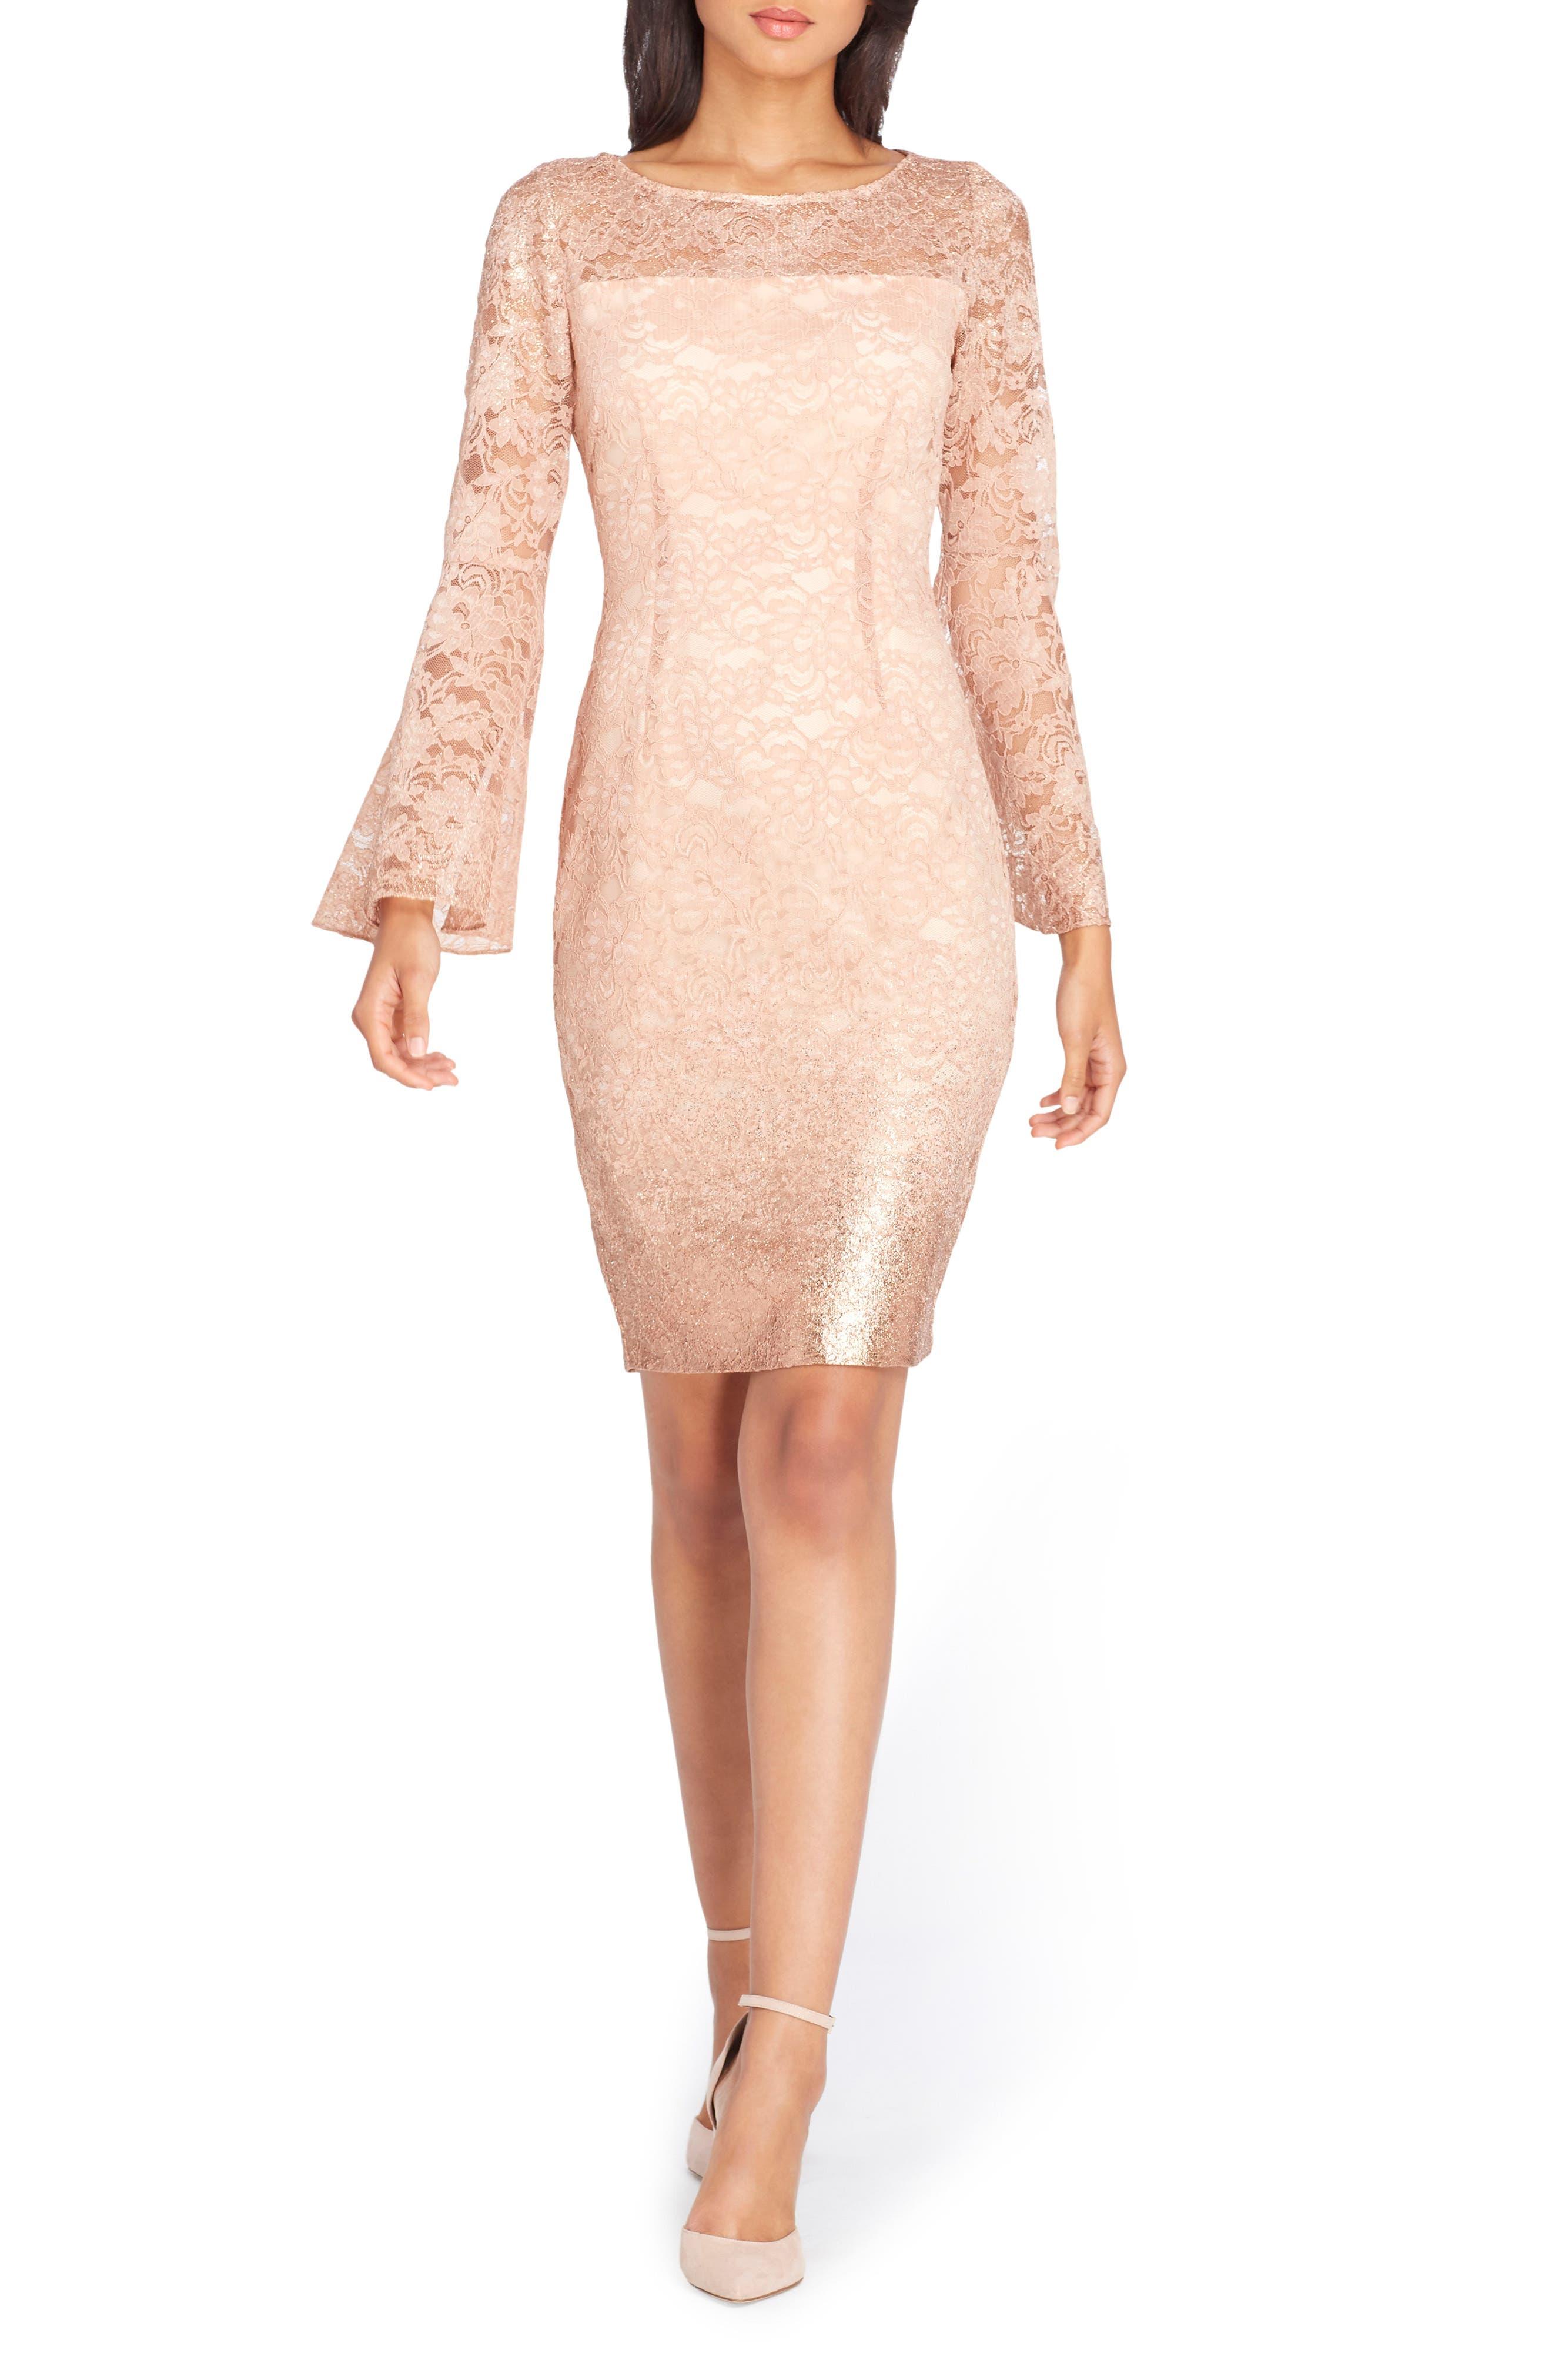 Alternate Image 1 Selected - Tahari Lace Bell Sleeve Sheath Dress